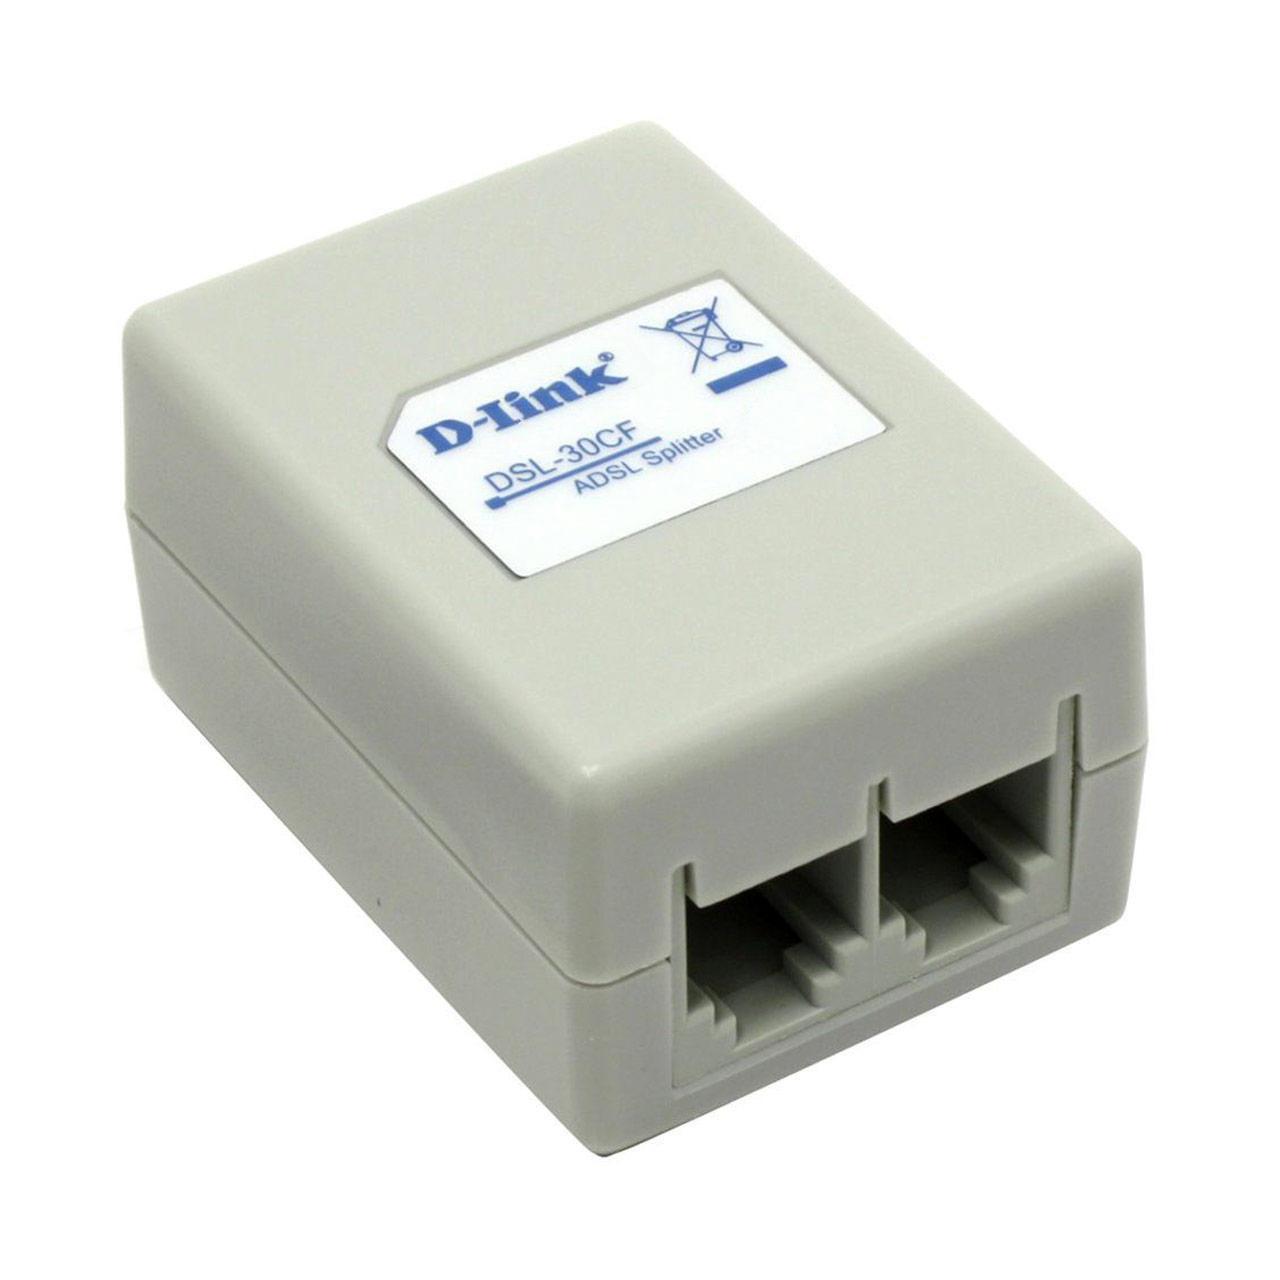 اسپلیتر و نویزگیر مودم ADSL برند D-Iink مدل DSL-30CF